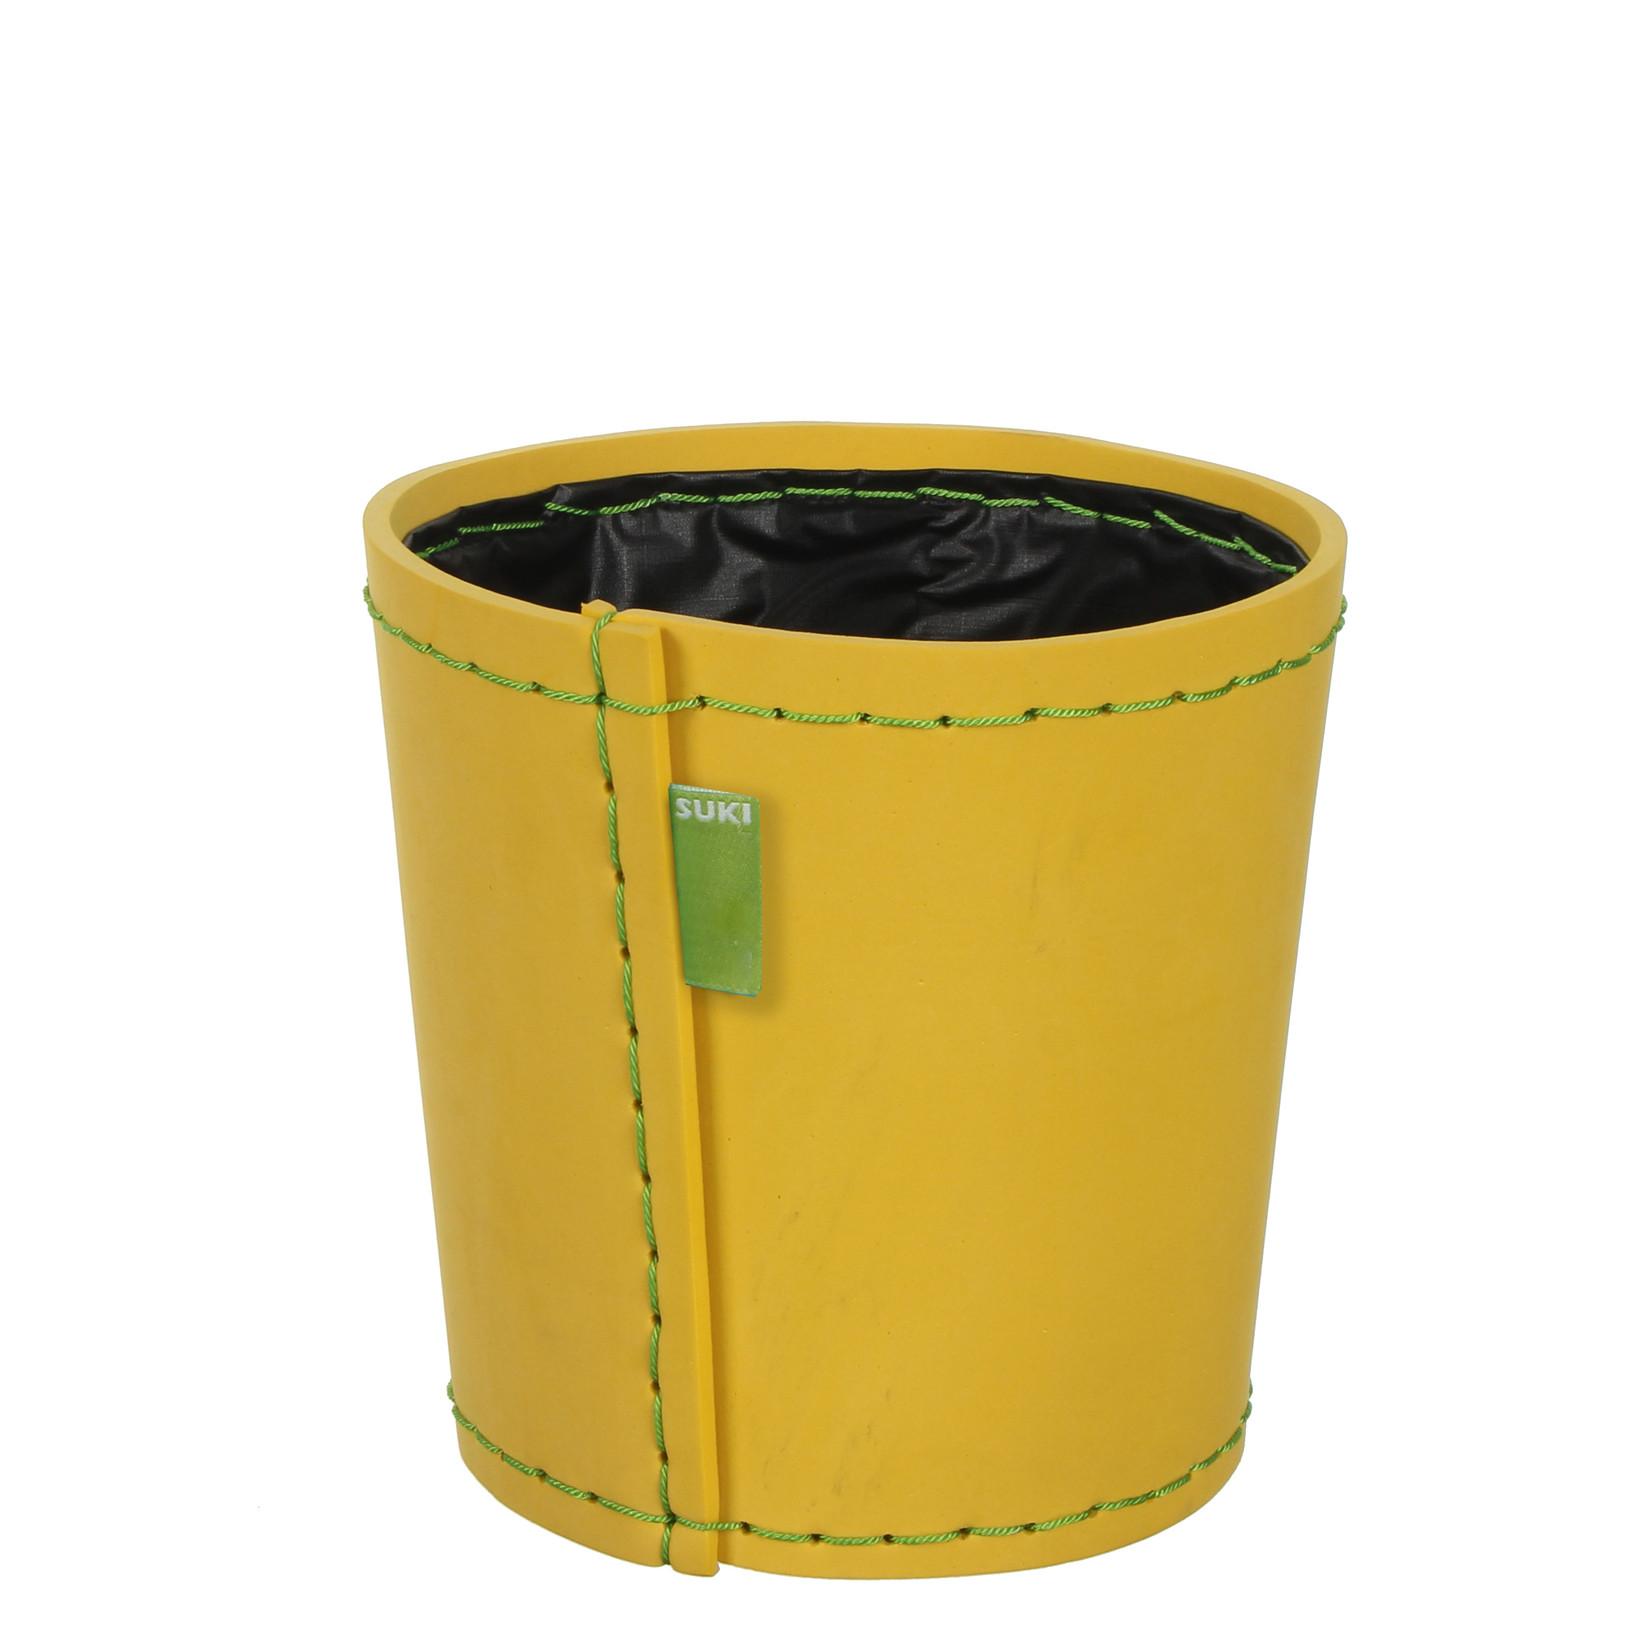 MiCa 153447 Pot around Suki Yellow